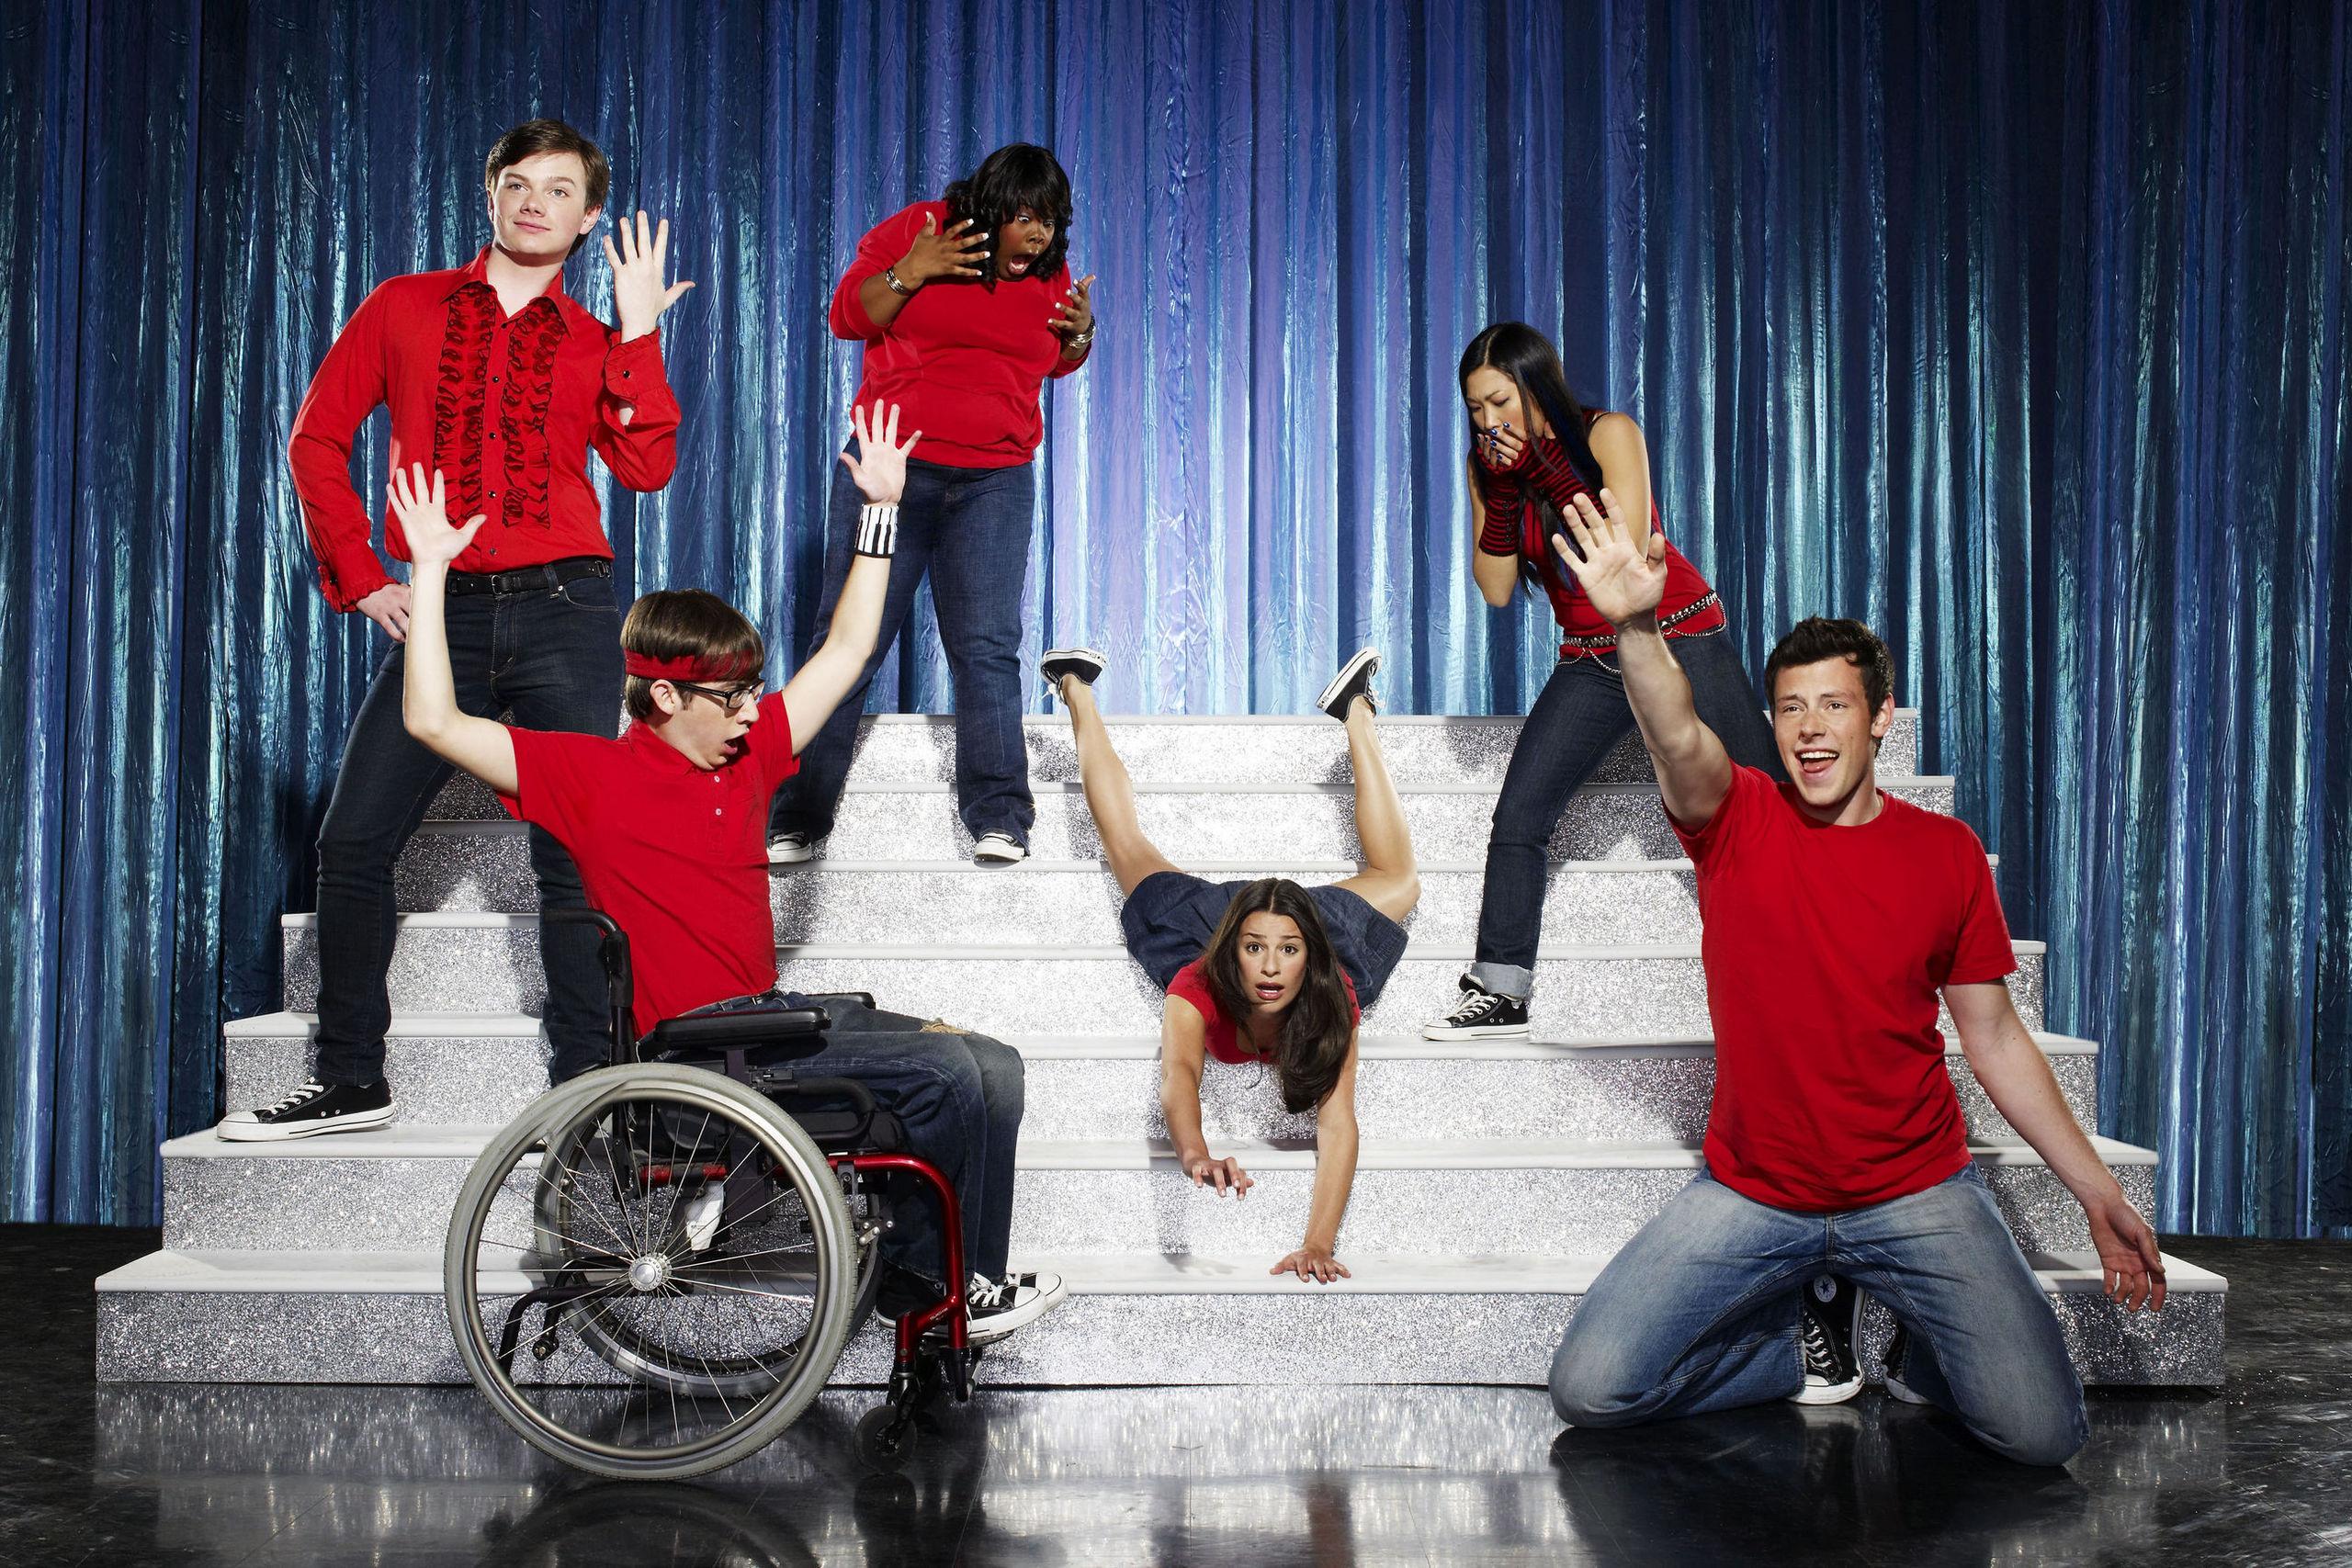 http://images2.fanpop.com/images/photos/6200000/Glee-glee-6211840-2560-1707.jpg